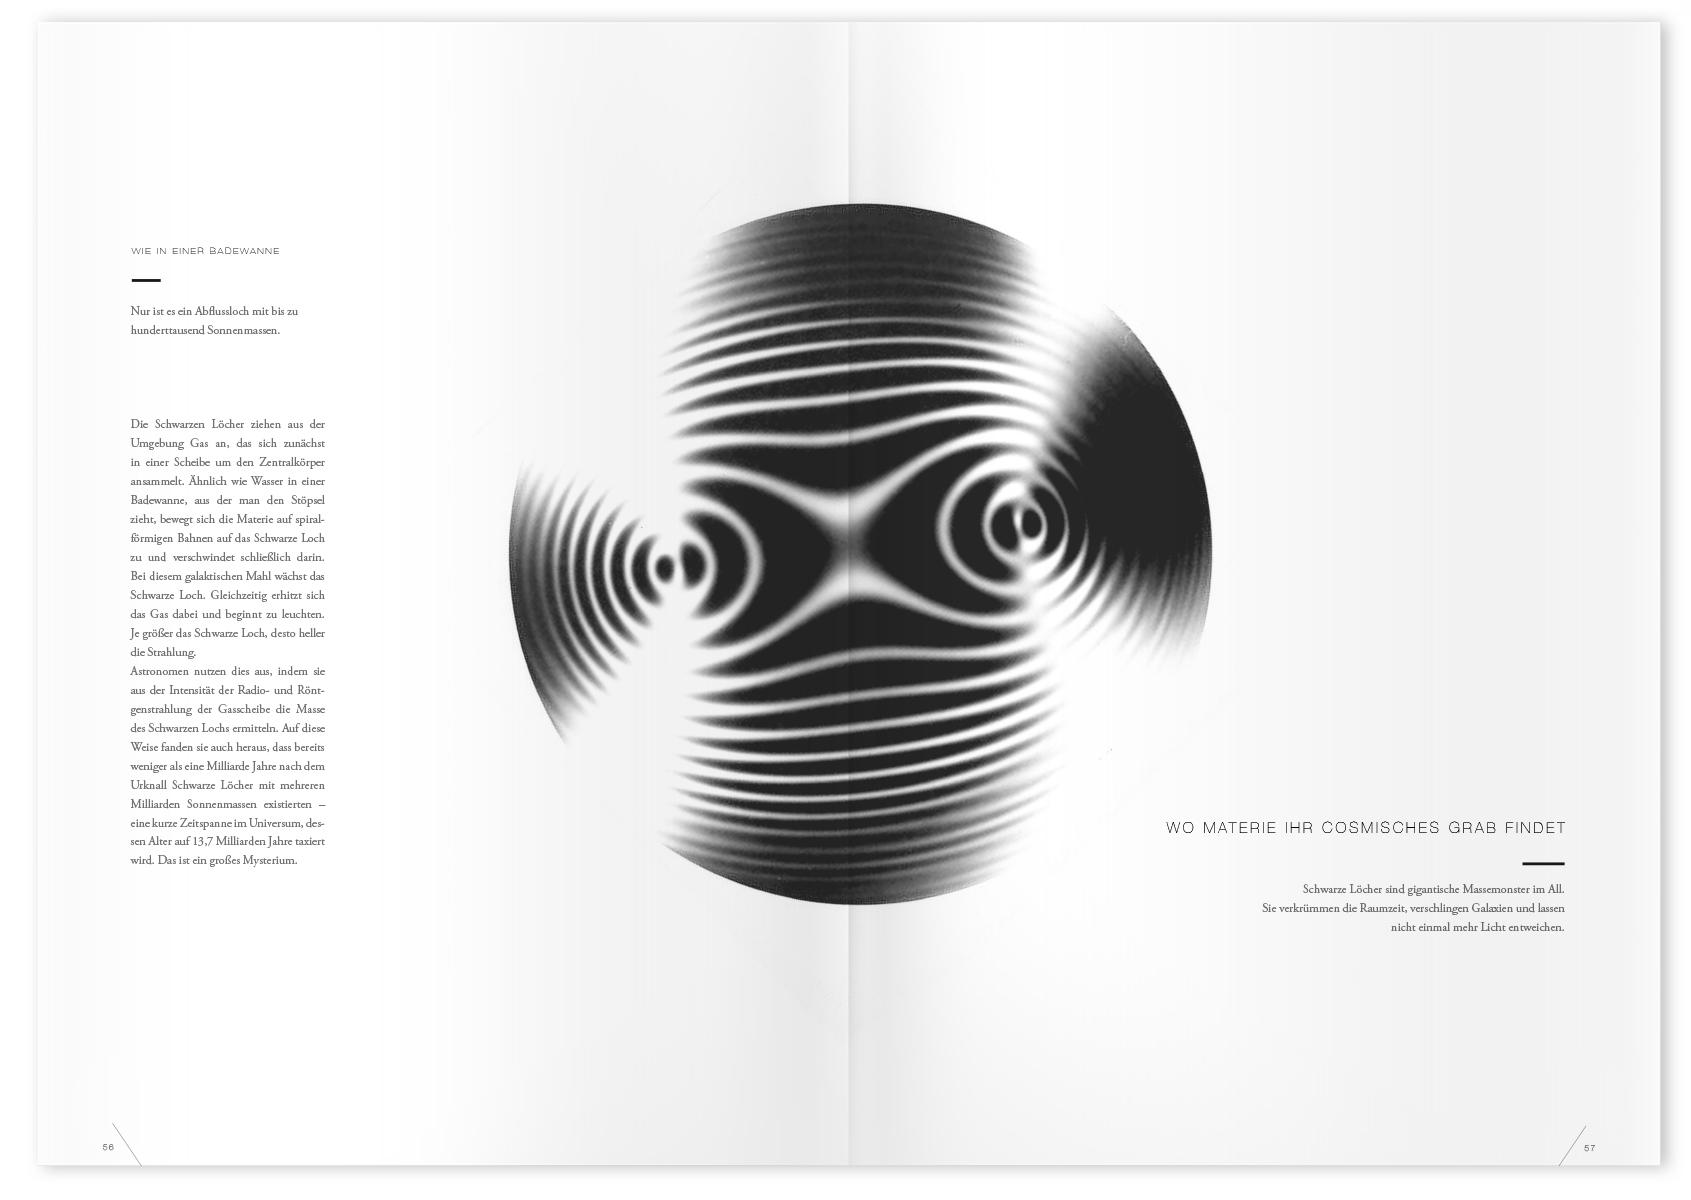 12_Cosmos-Magazin_hsrm-Hochschule-RheinMain_Editorial-Design_Grafikdesign_Gloria-Kison.jpg